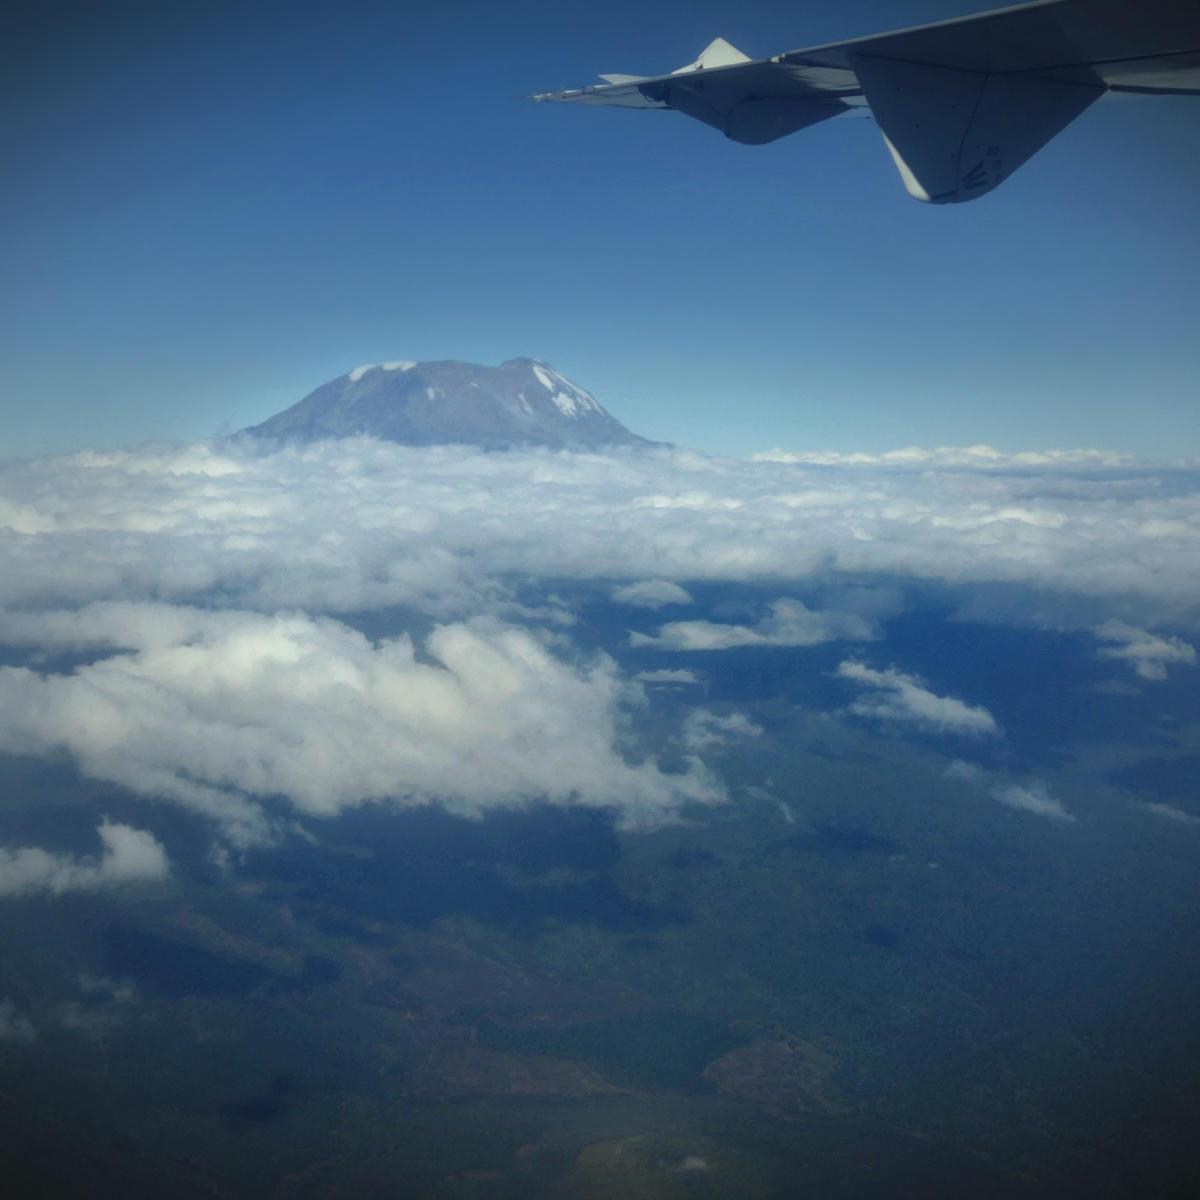 Mount Kilimanjaro passes under the wingtip as Noah leaves Kenya. Mount Kilimanjaro passes under the wingtip as Noah leaves Kenya. Noah Strycker